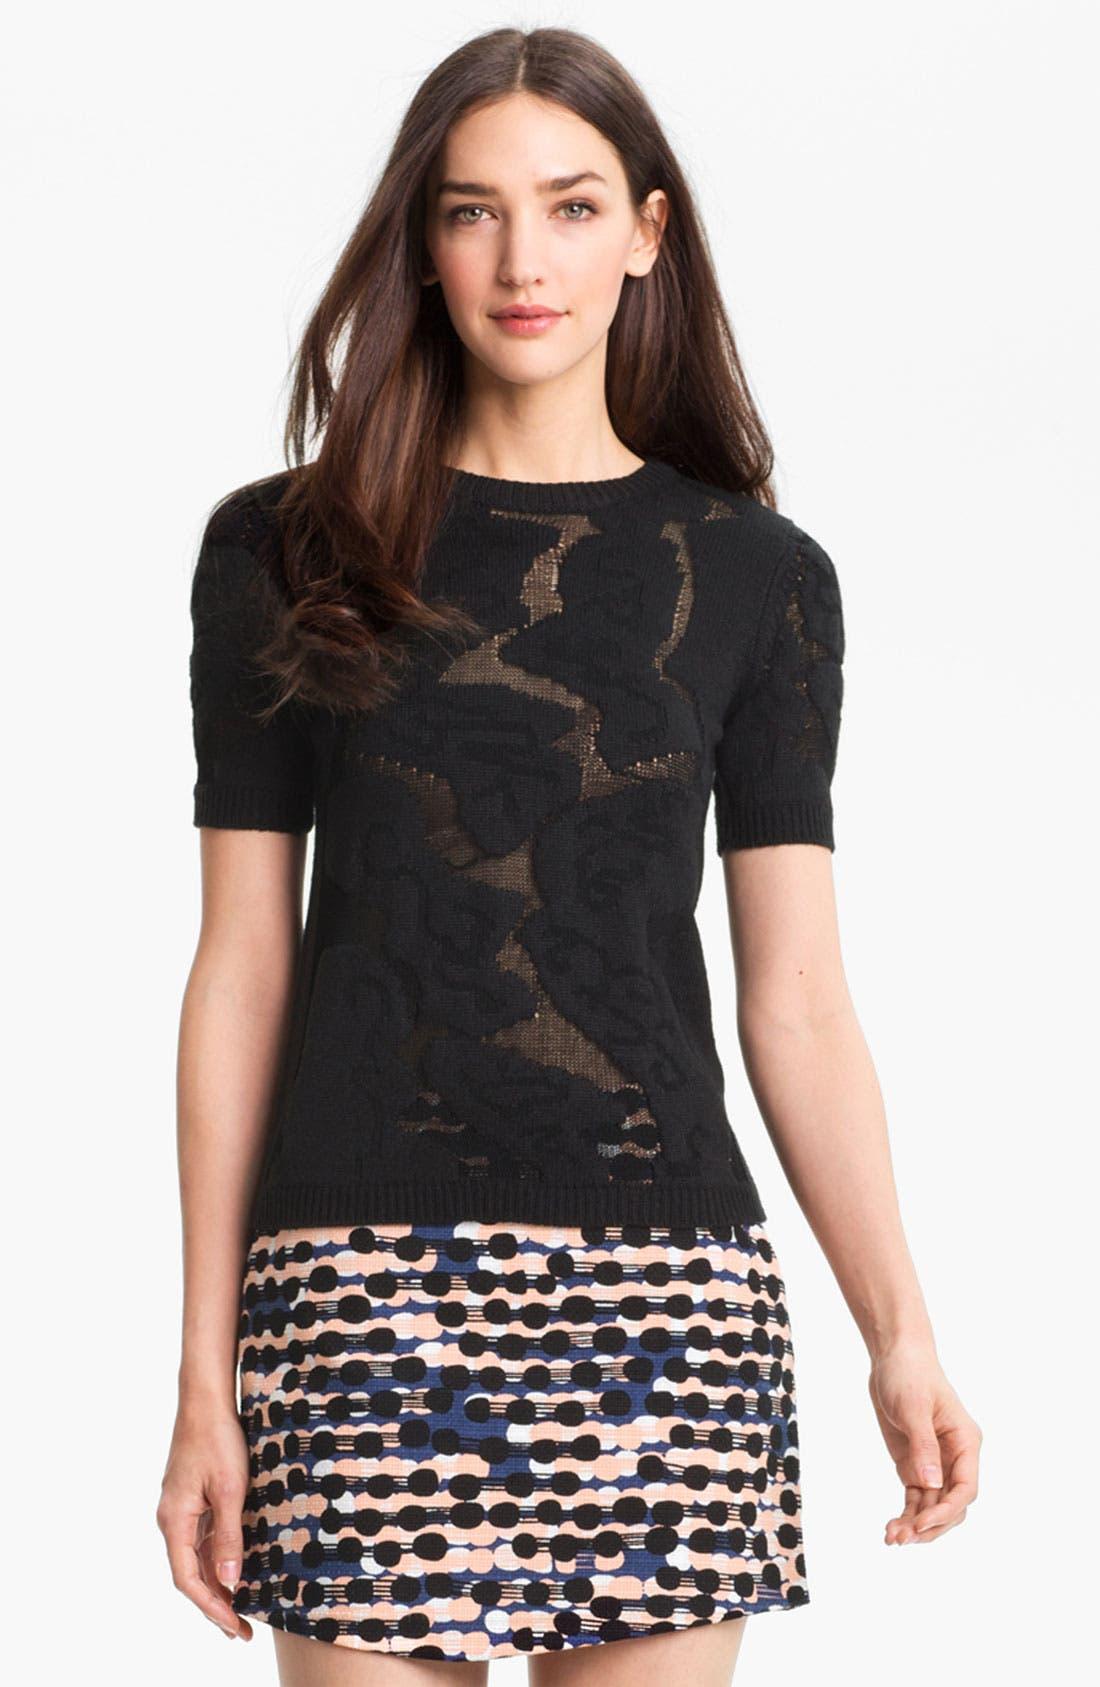 Alternate Image 1 Selected - Diane von Furstenberg 'Addi' Sweater